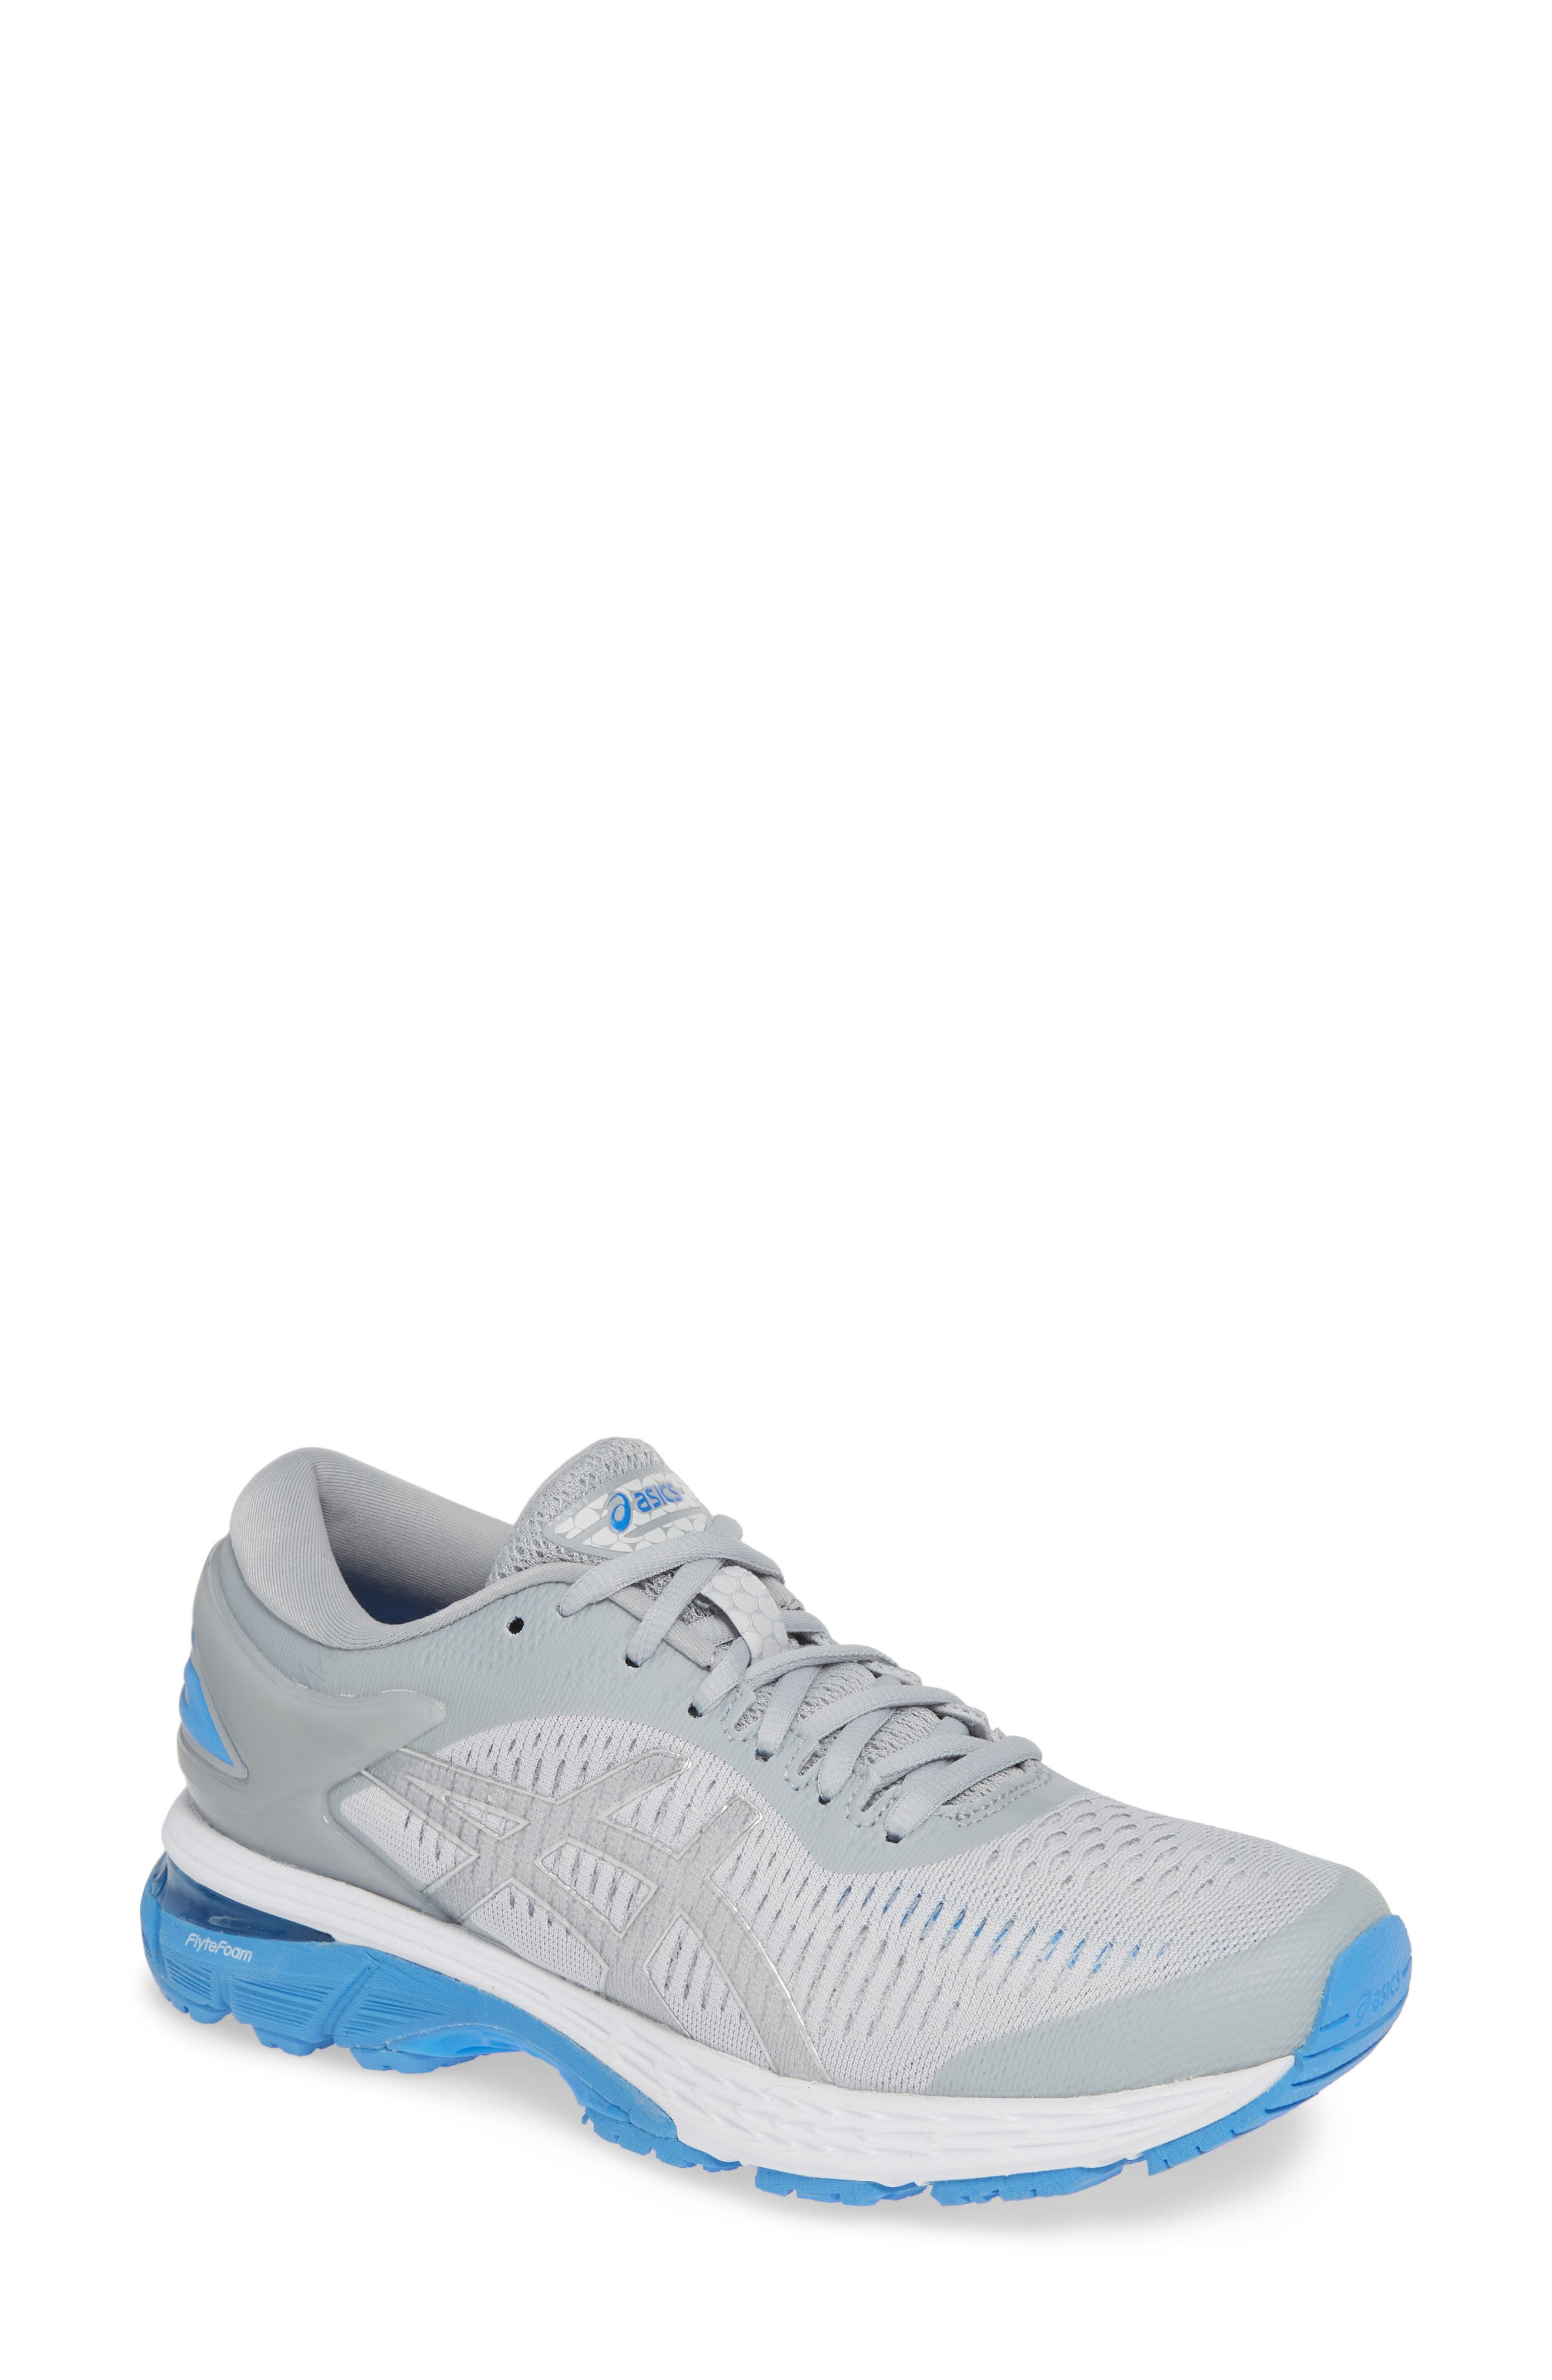 GEL-Kayano<sup>®</sup> 25 Running Shoe,                             Main thumbnail 1, color,                             MID GREY/ BLUE